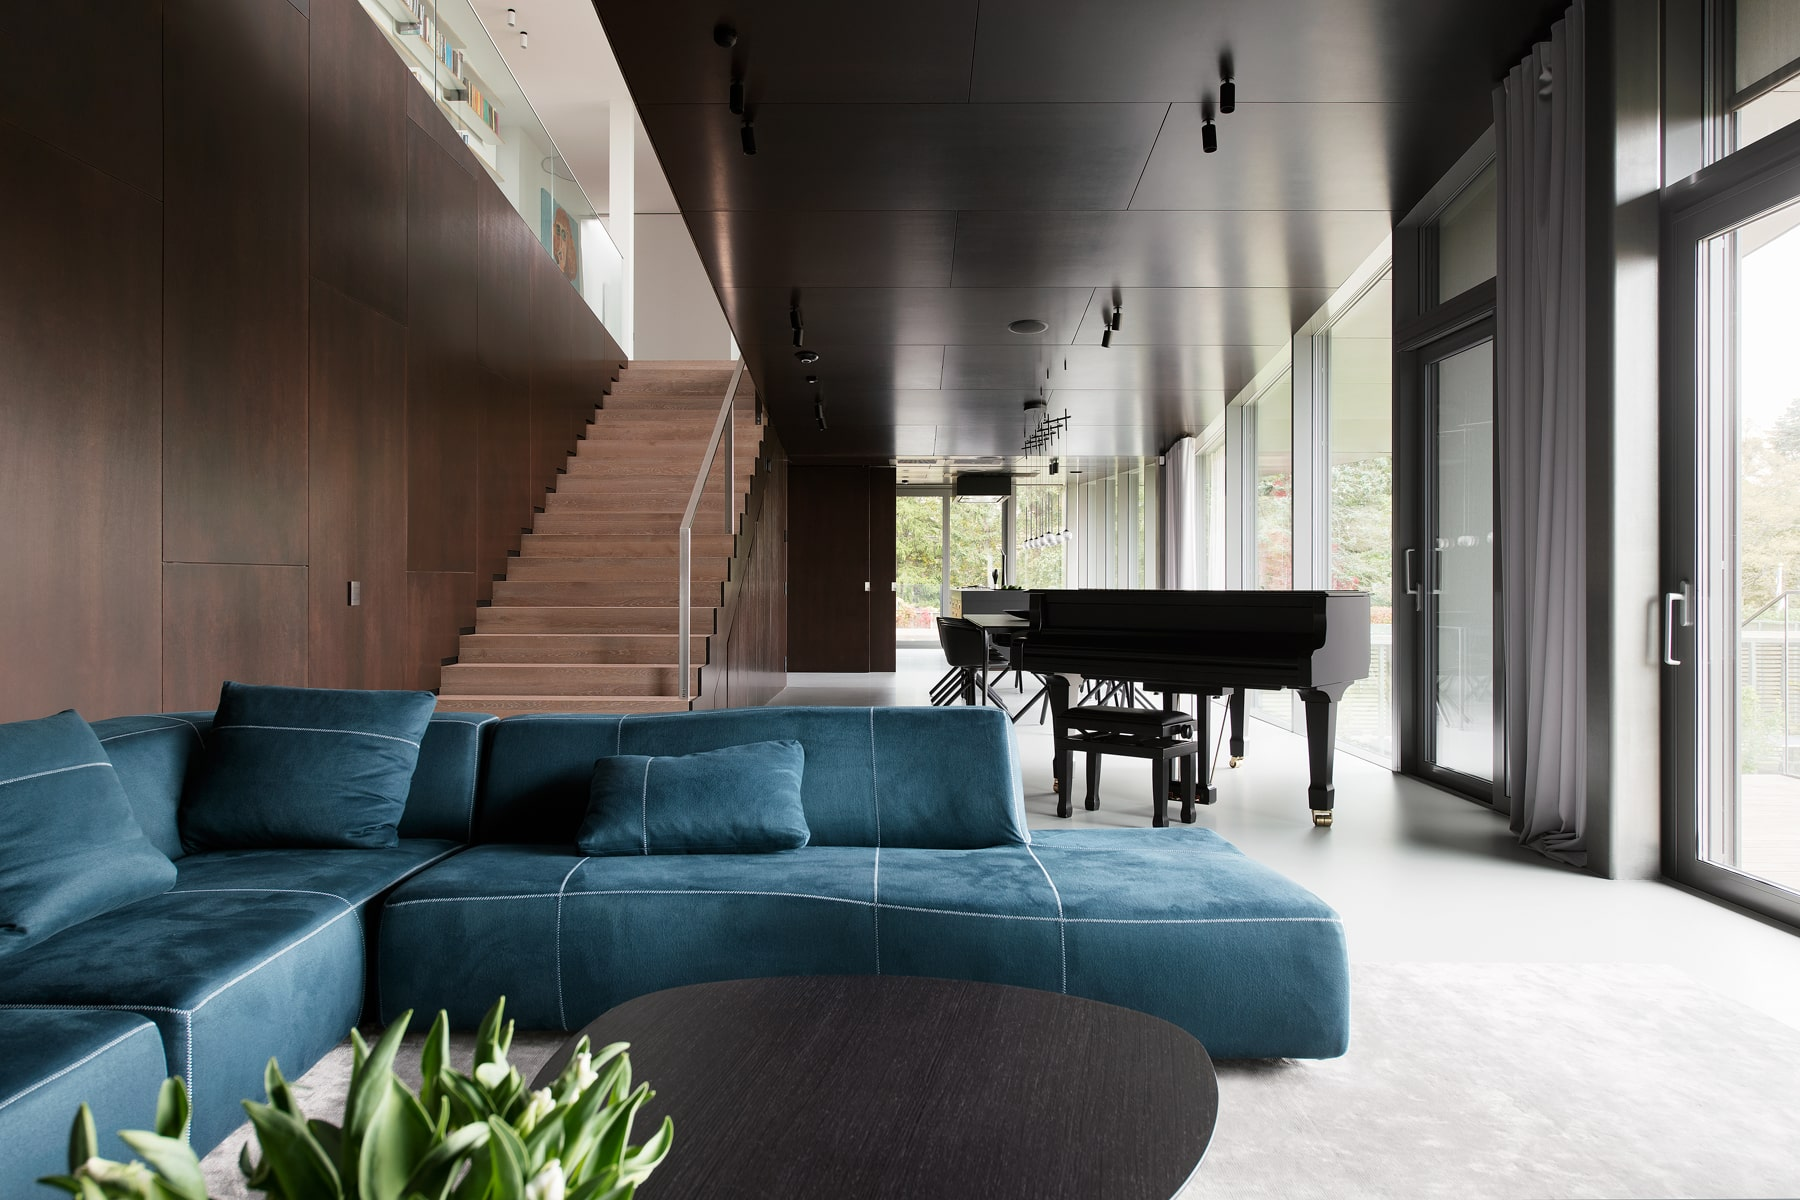 Living room of a private estate in Merivälja